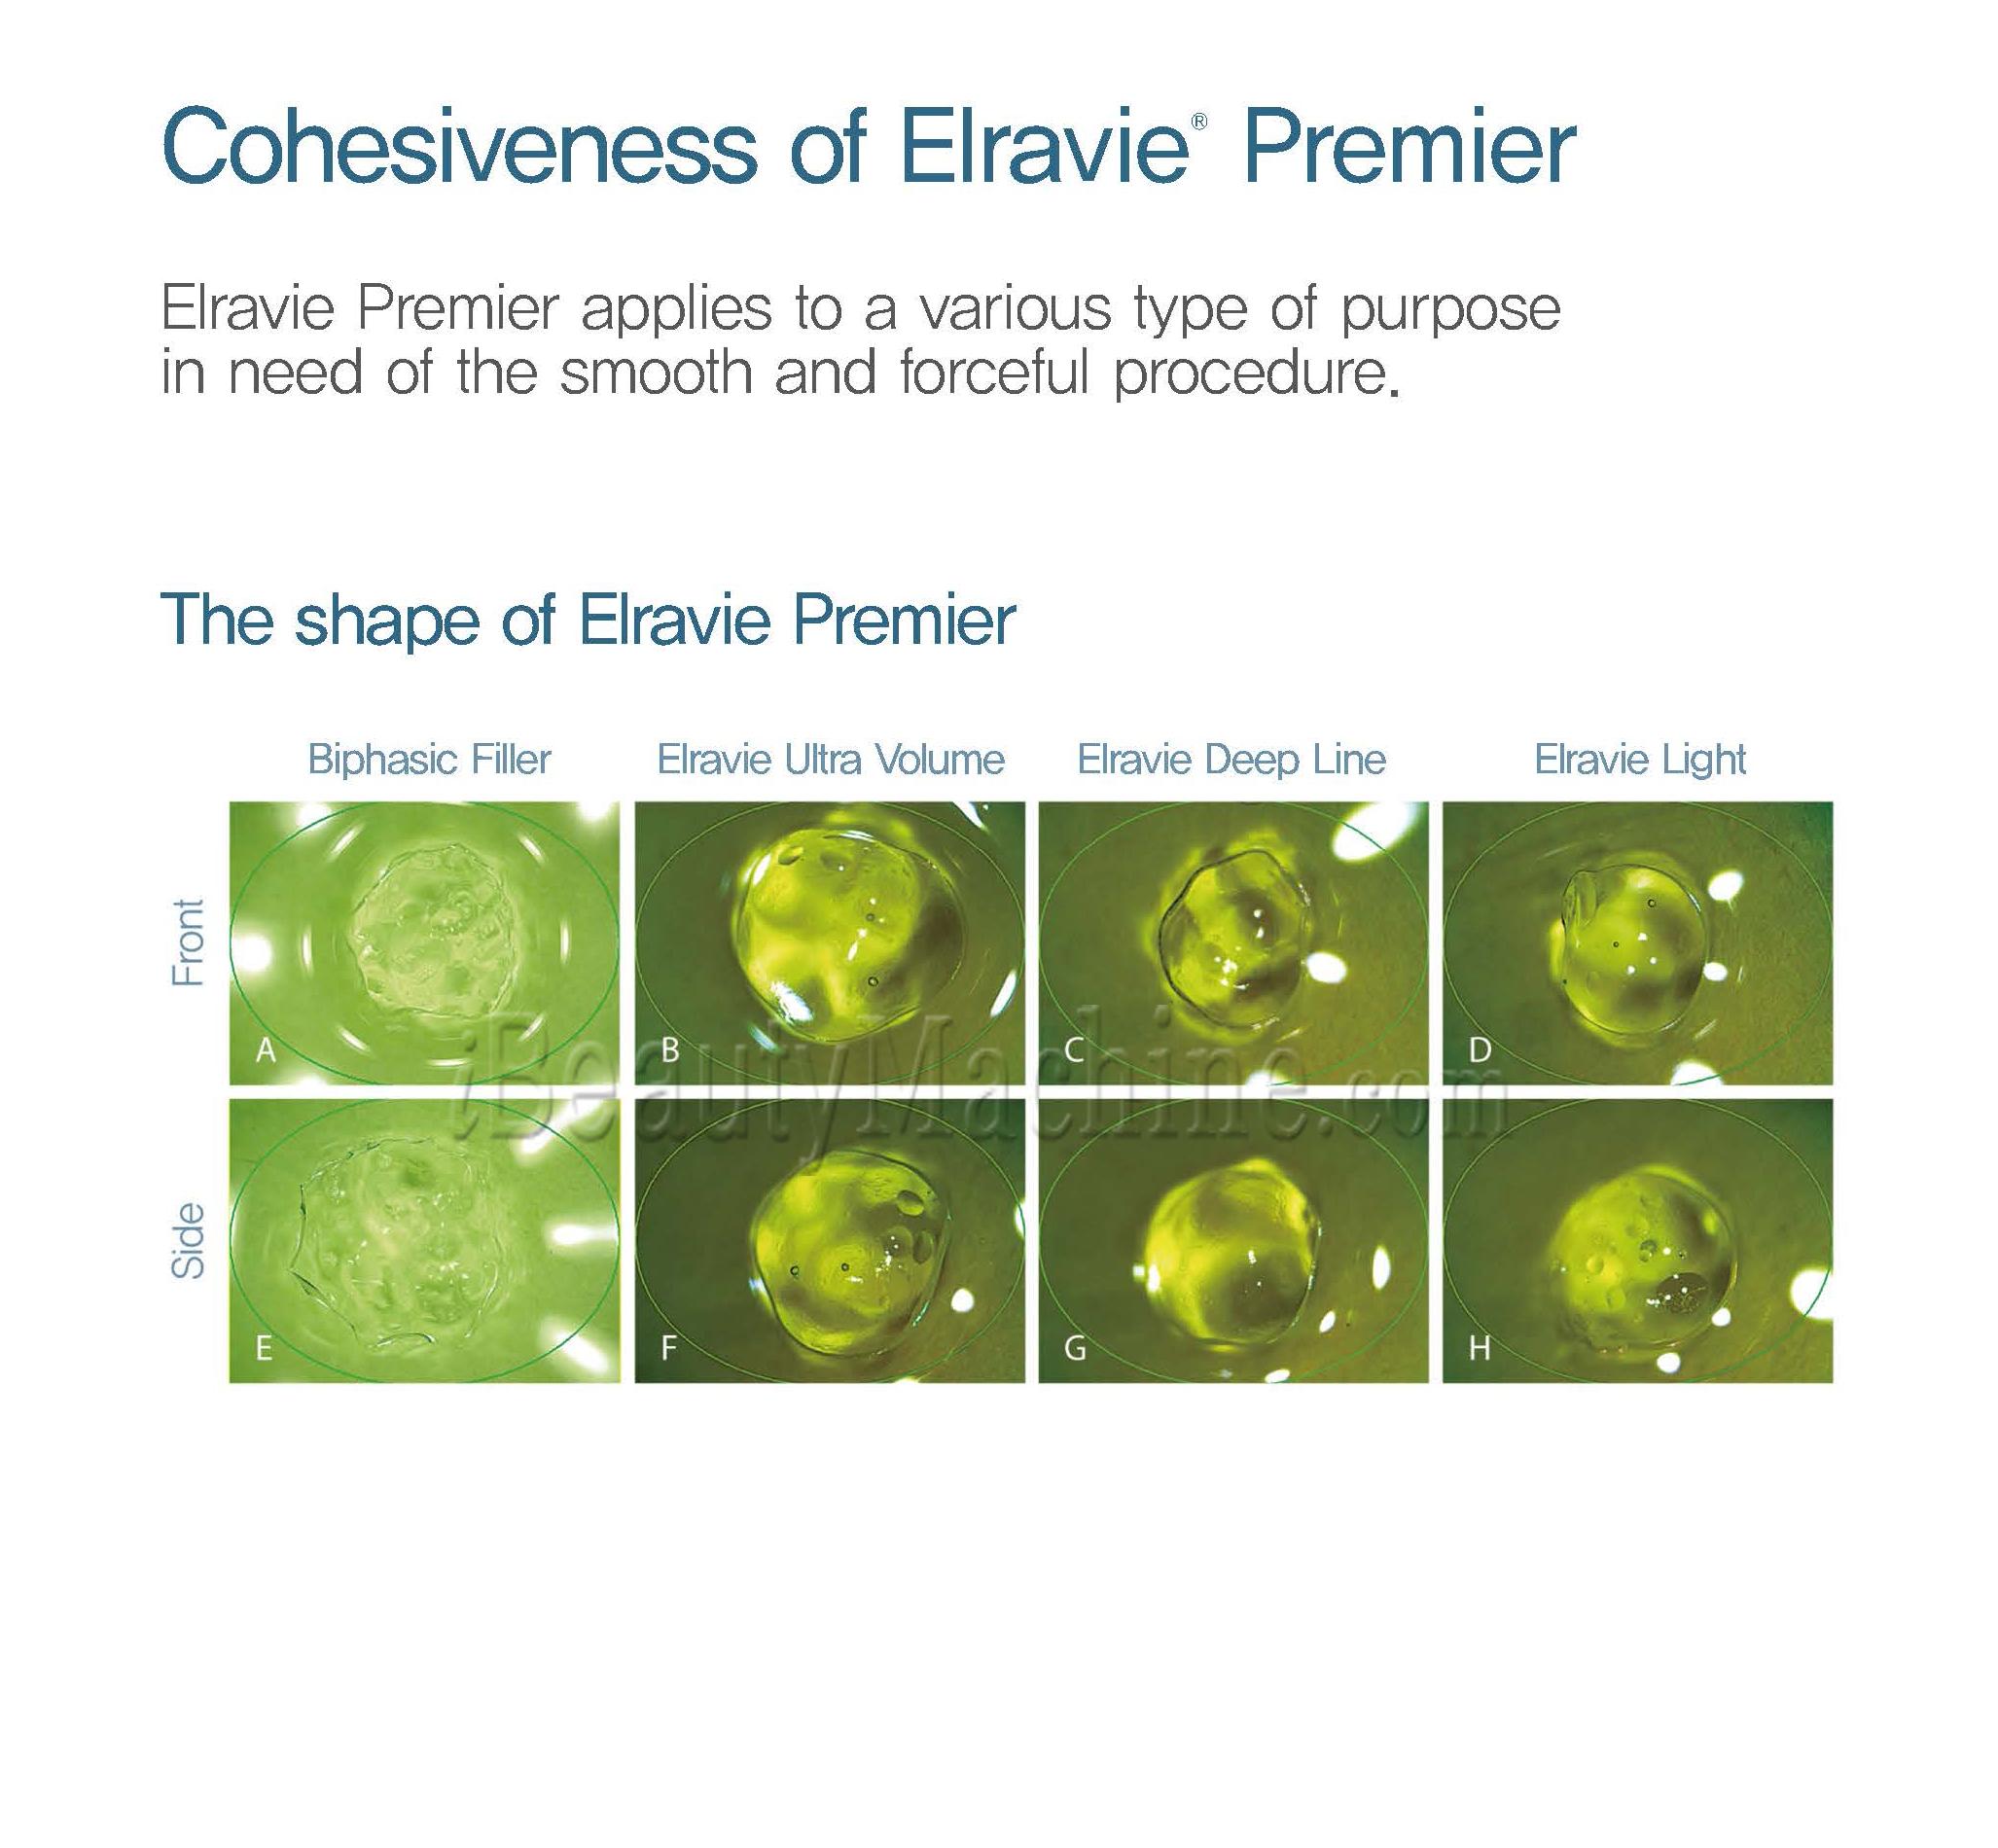 cohesiveness of elravie premier